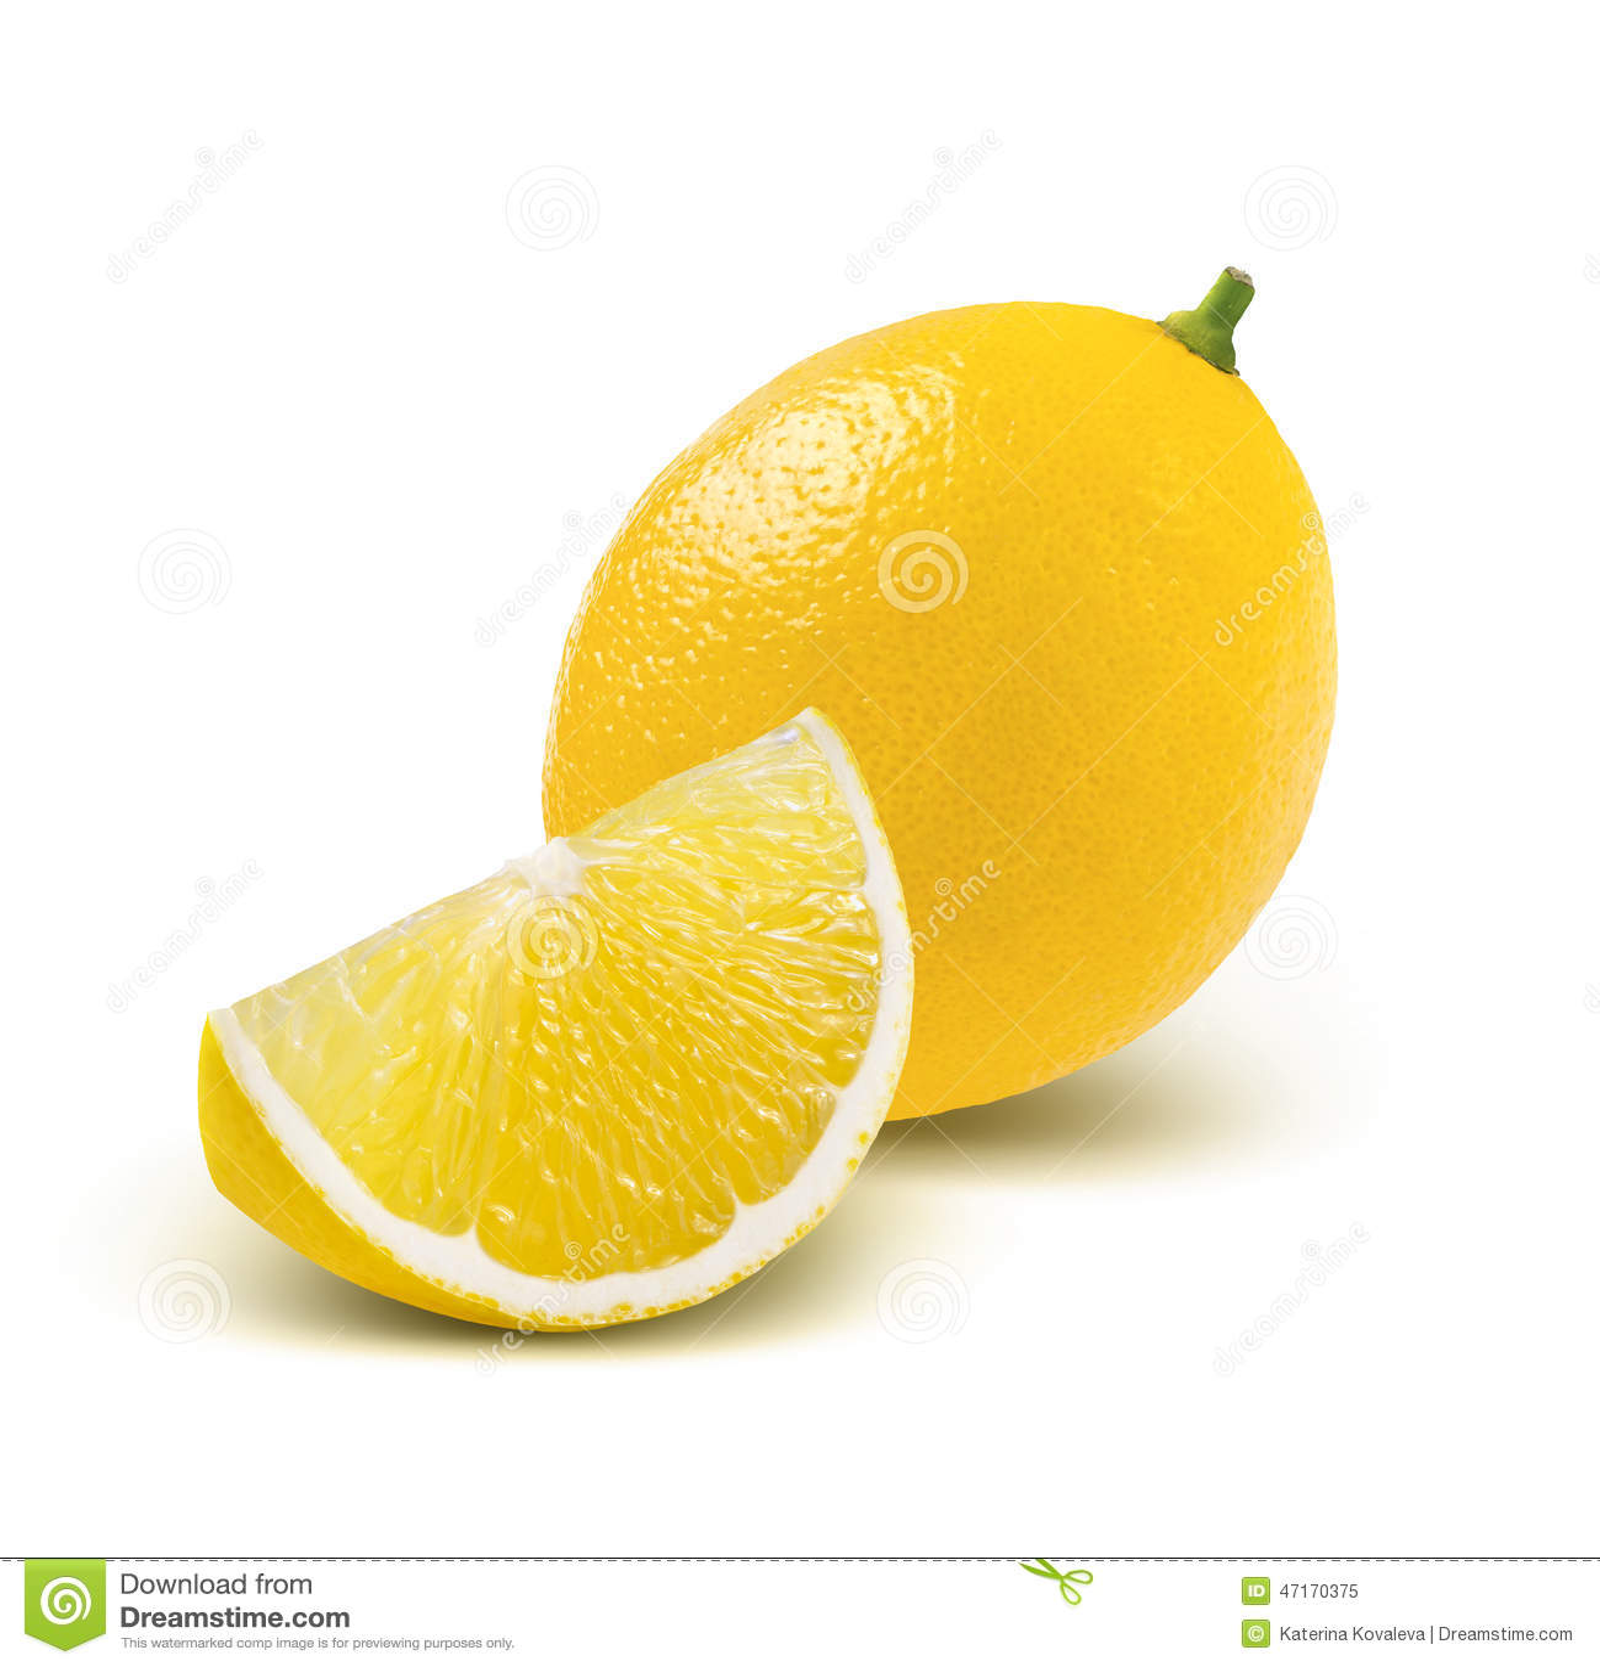 Whole lemon and quarter Quarter Lemon